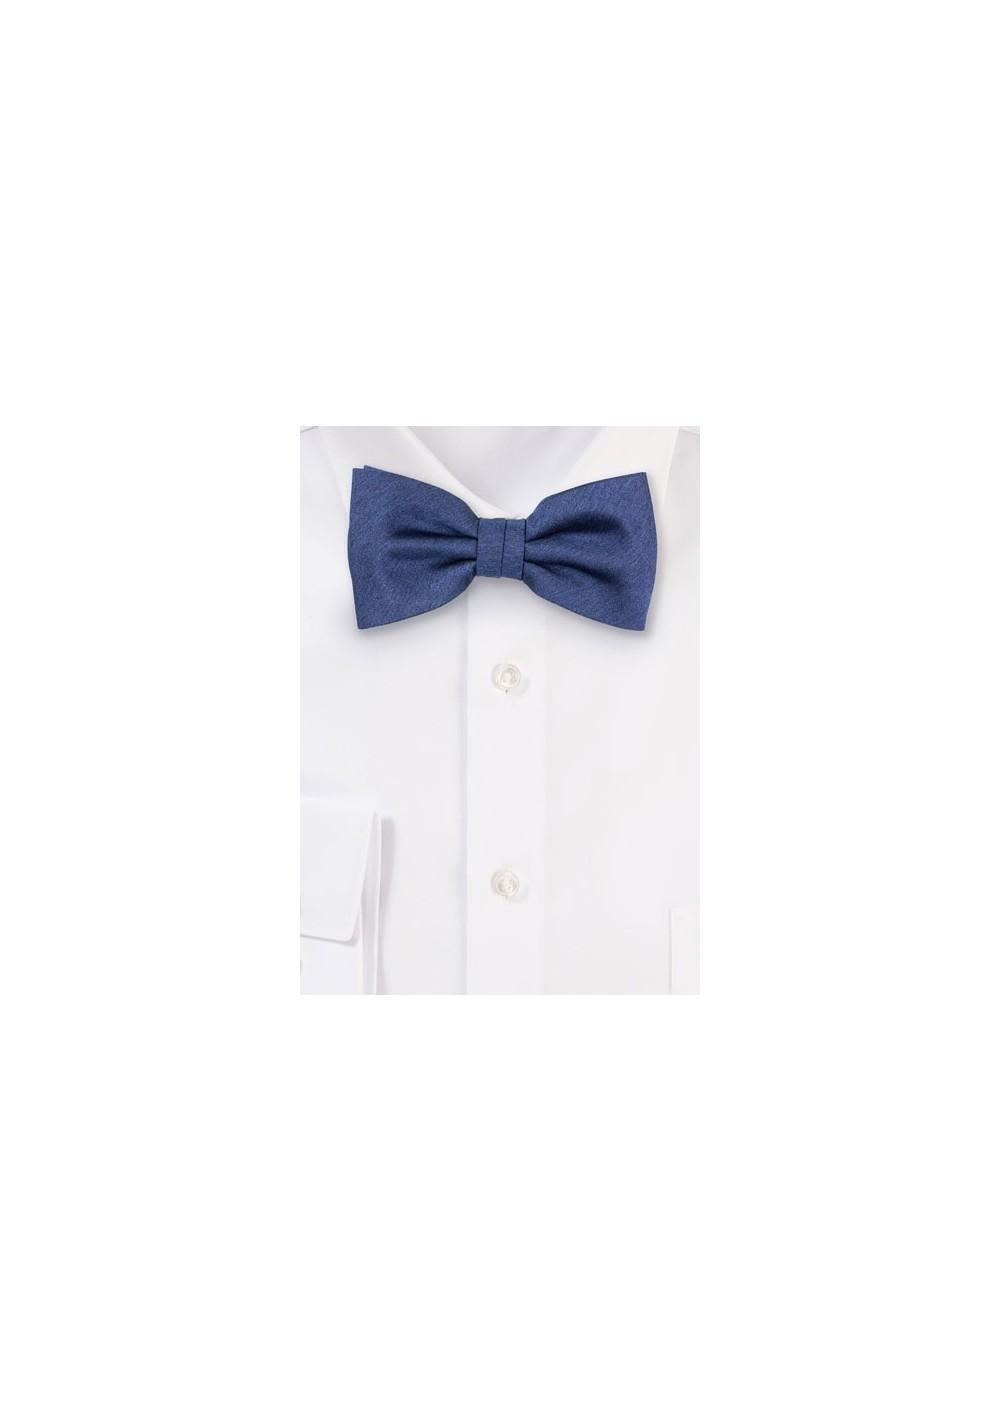 Heather Slate Blue Bow Tie